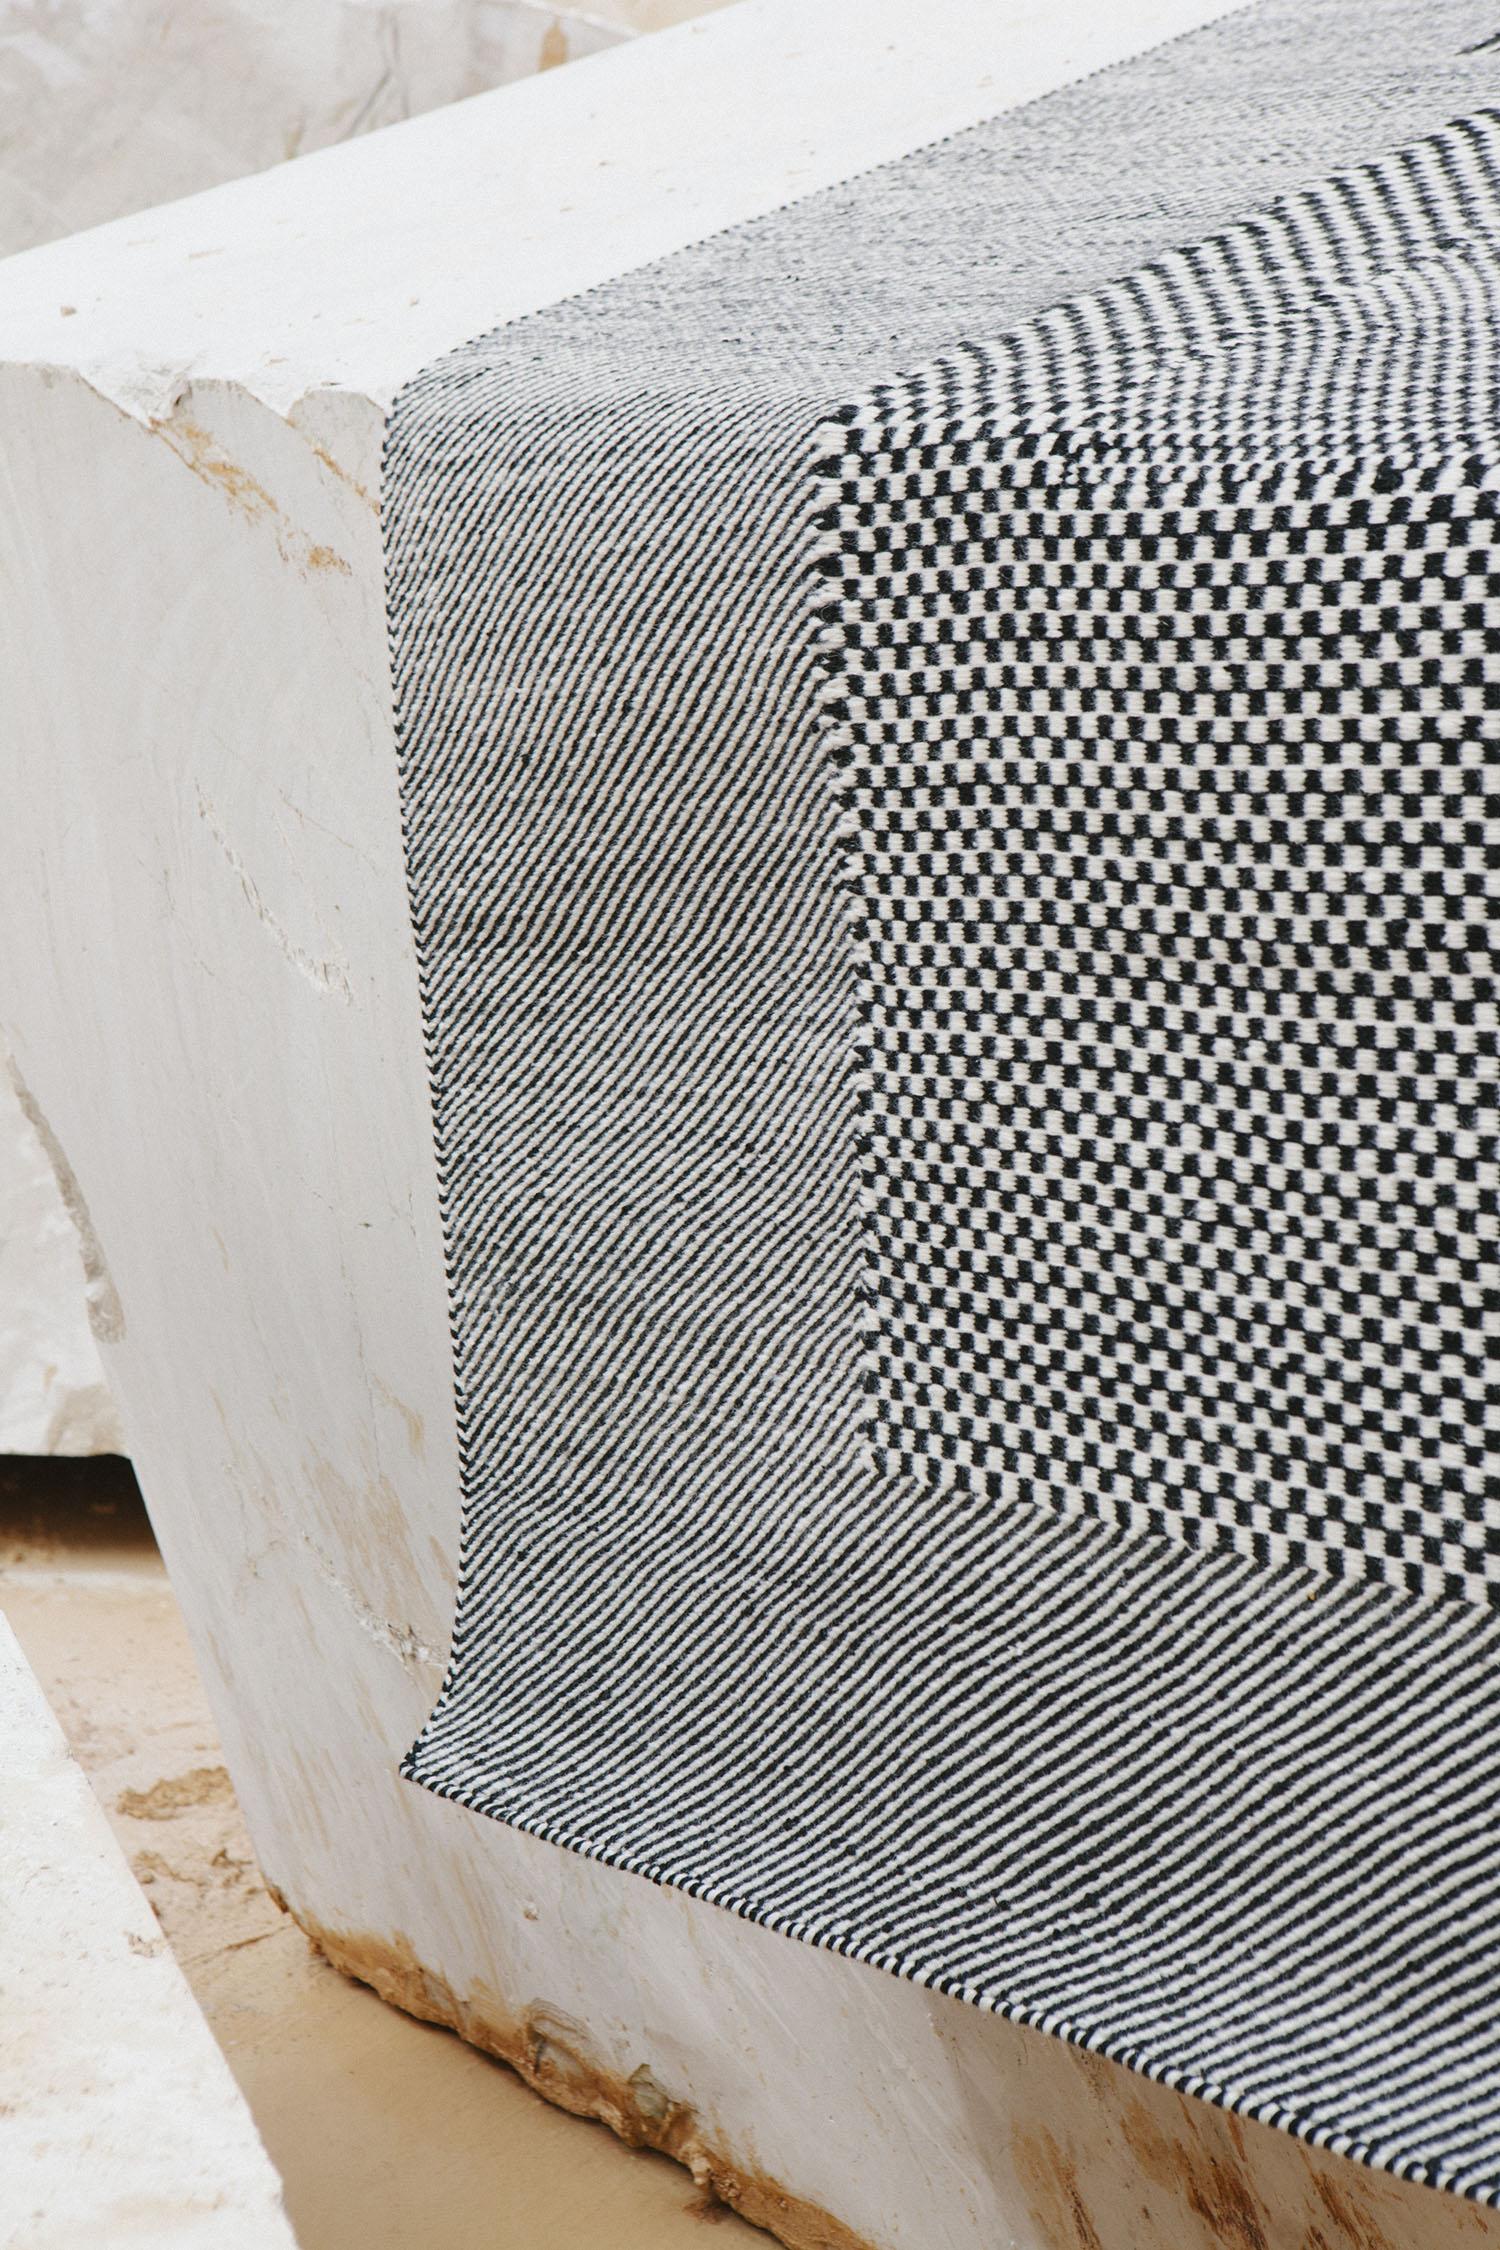 Karpeta - Rugs designed for the new collection of Karpeta